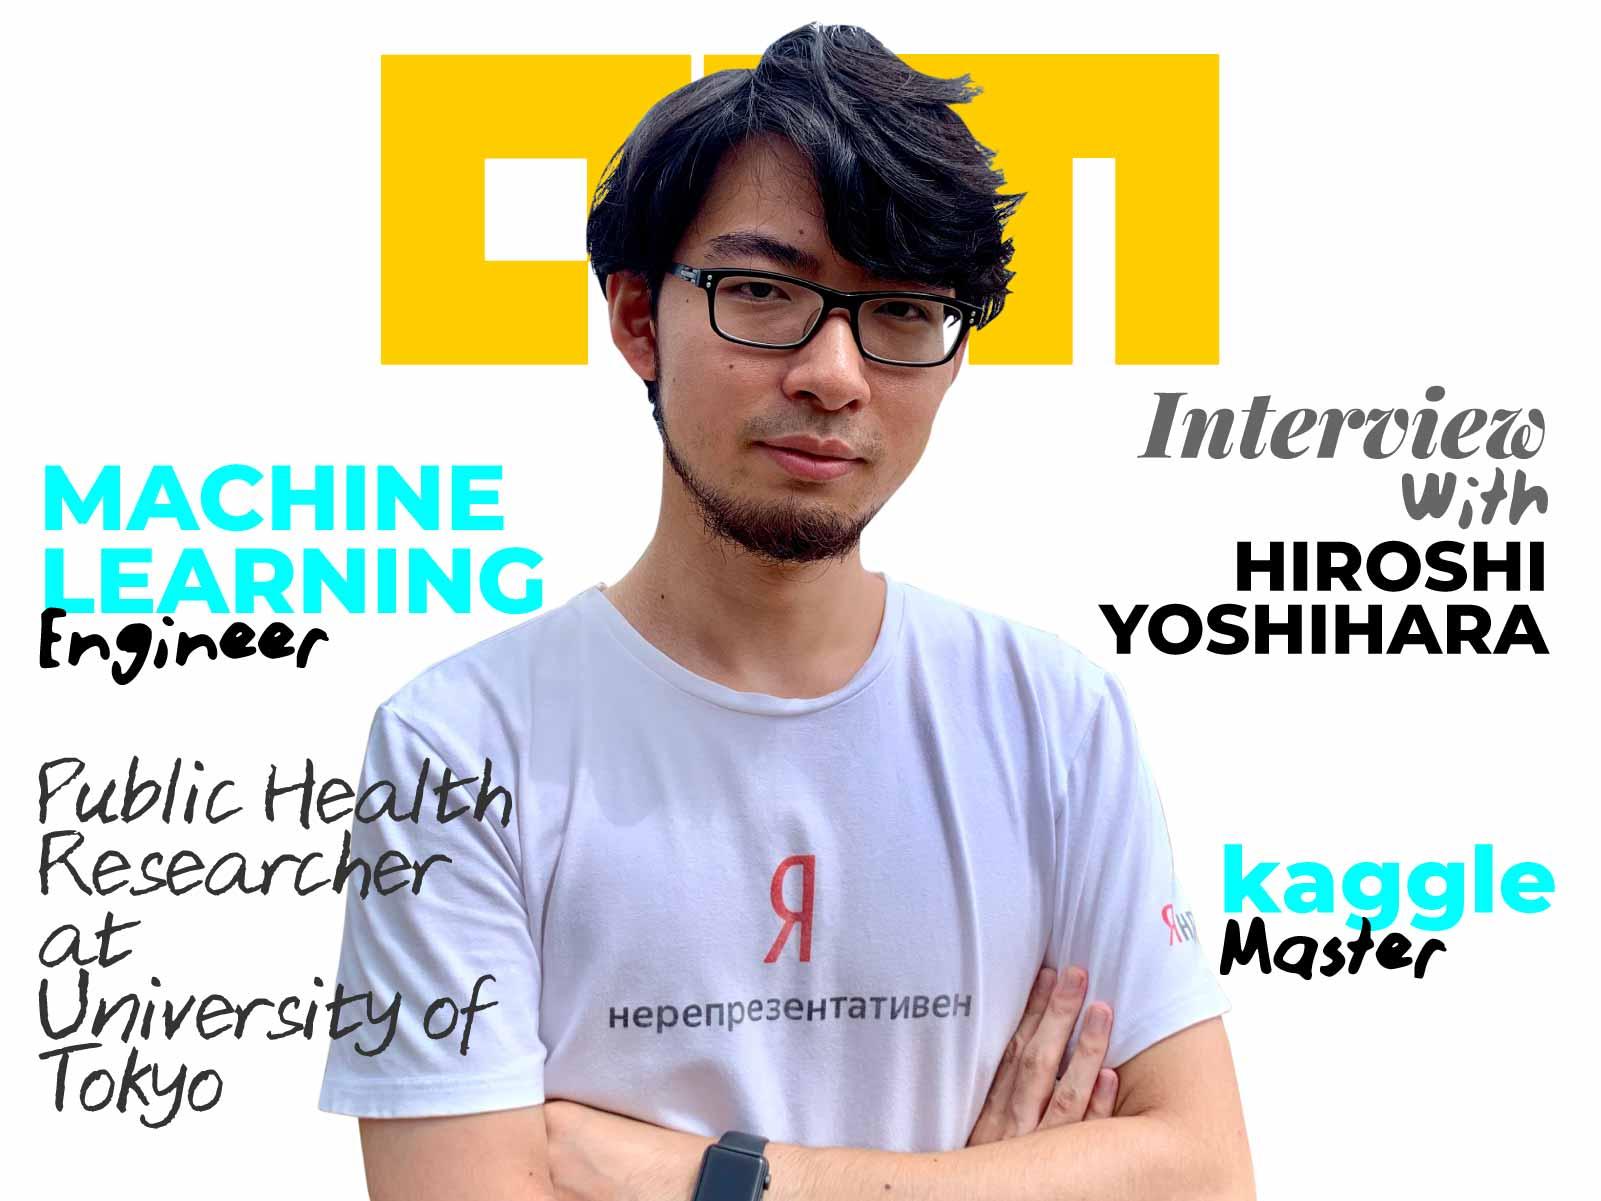 Interview With Kaggle Master And ML Engineer Hiroshi Yoshihara